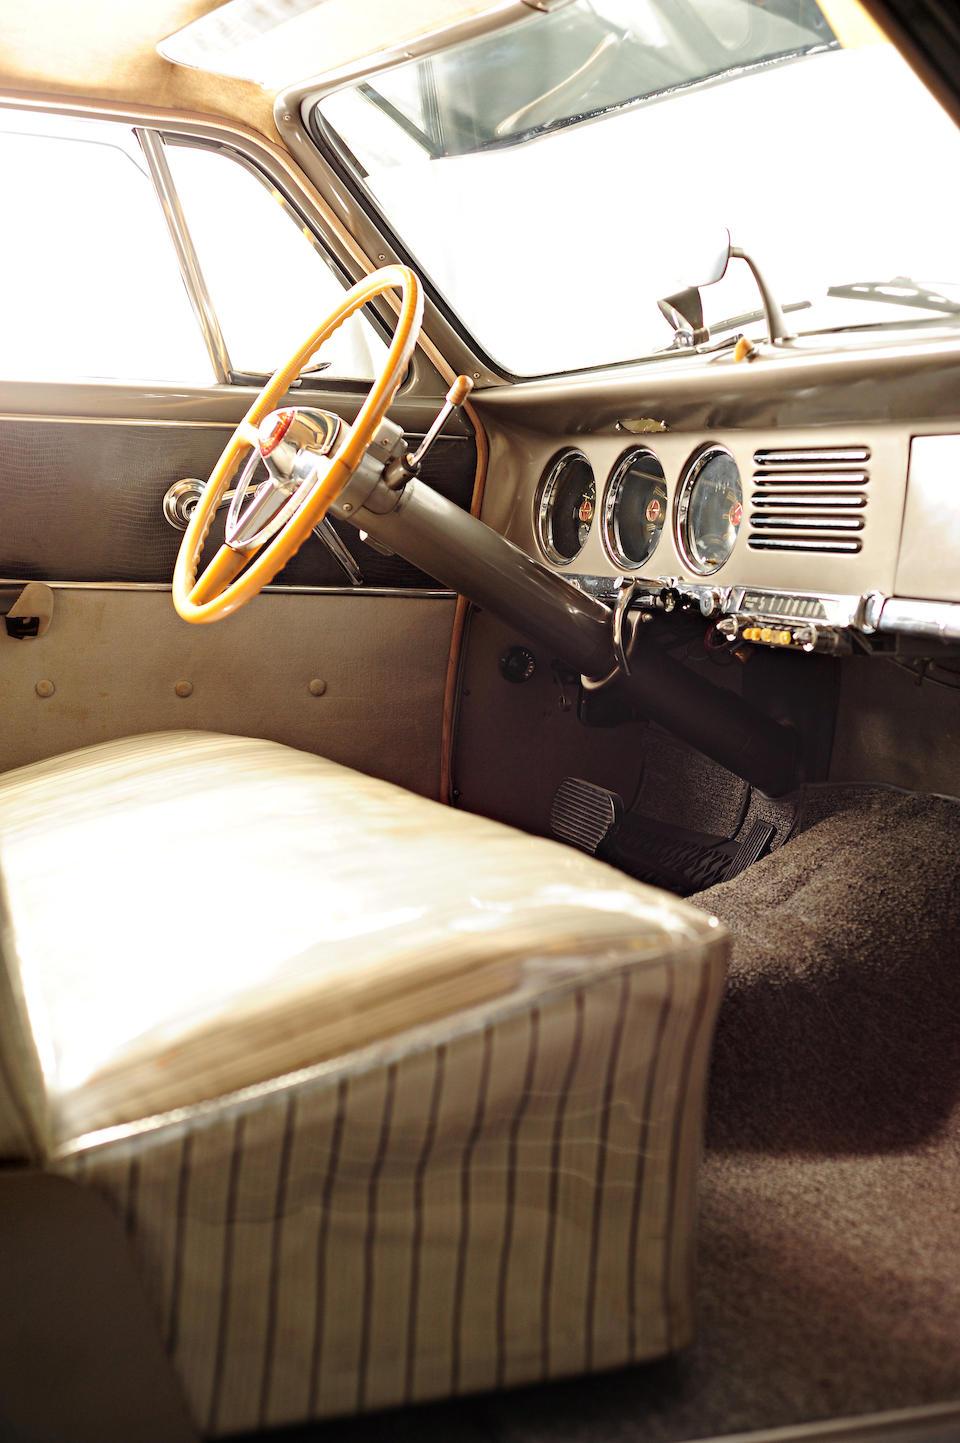 1951 Studebaker Land Cruiser Sedan  Chassis no. 8135387